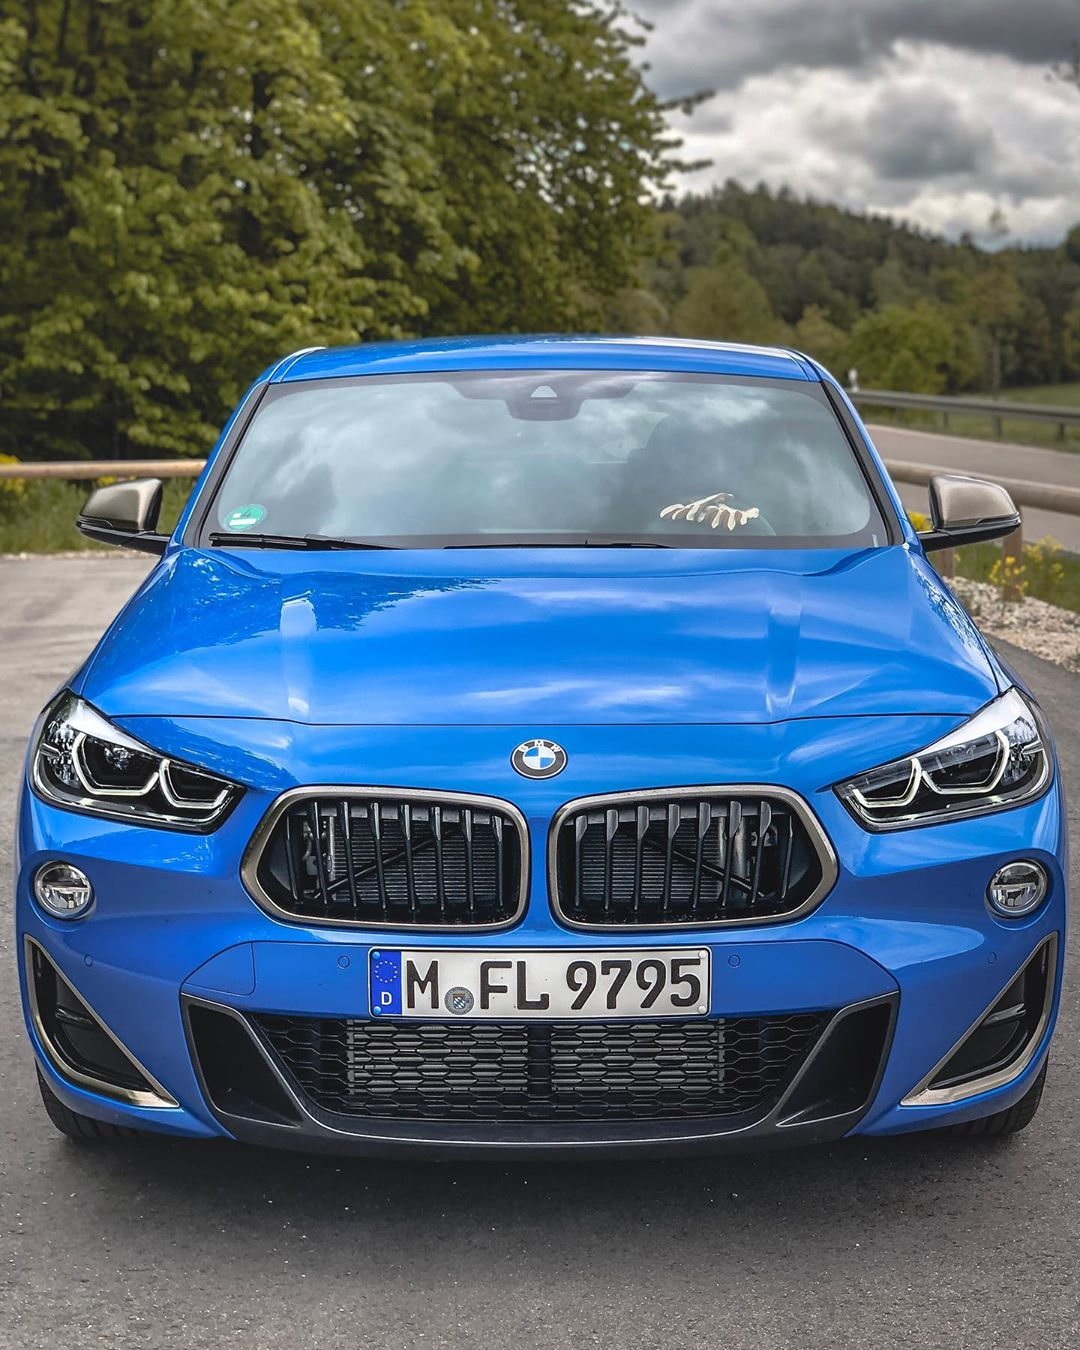 X2 M35i💥🤘…first 4-Cylinder M-Performance car/engine….and I can already tell you that that isn't a bad thing at all😬 @bmw_x2_fan @bmw #bmw #bmwx2 #bmwx2m35i #x2m35i #automanntv #munich #mperformance